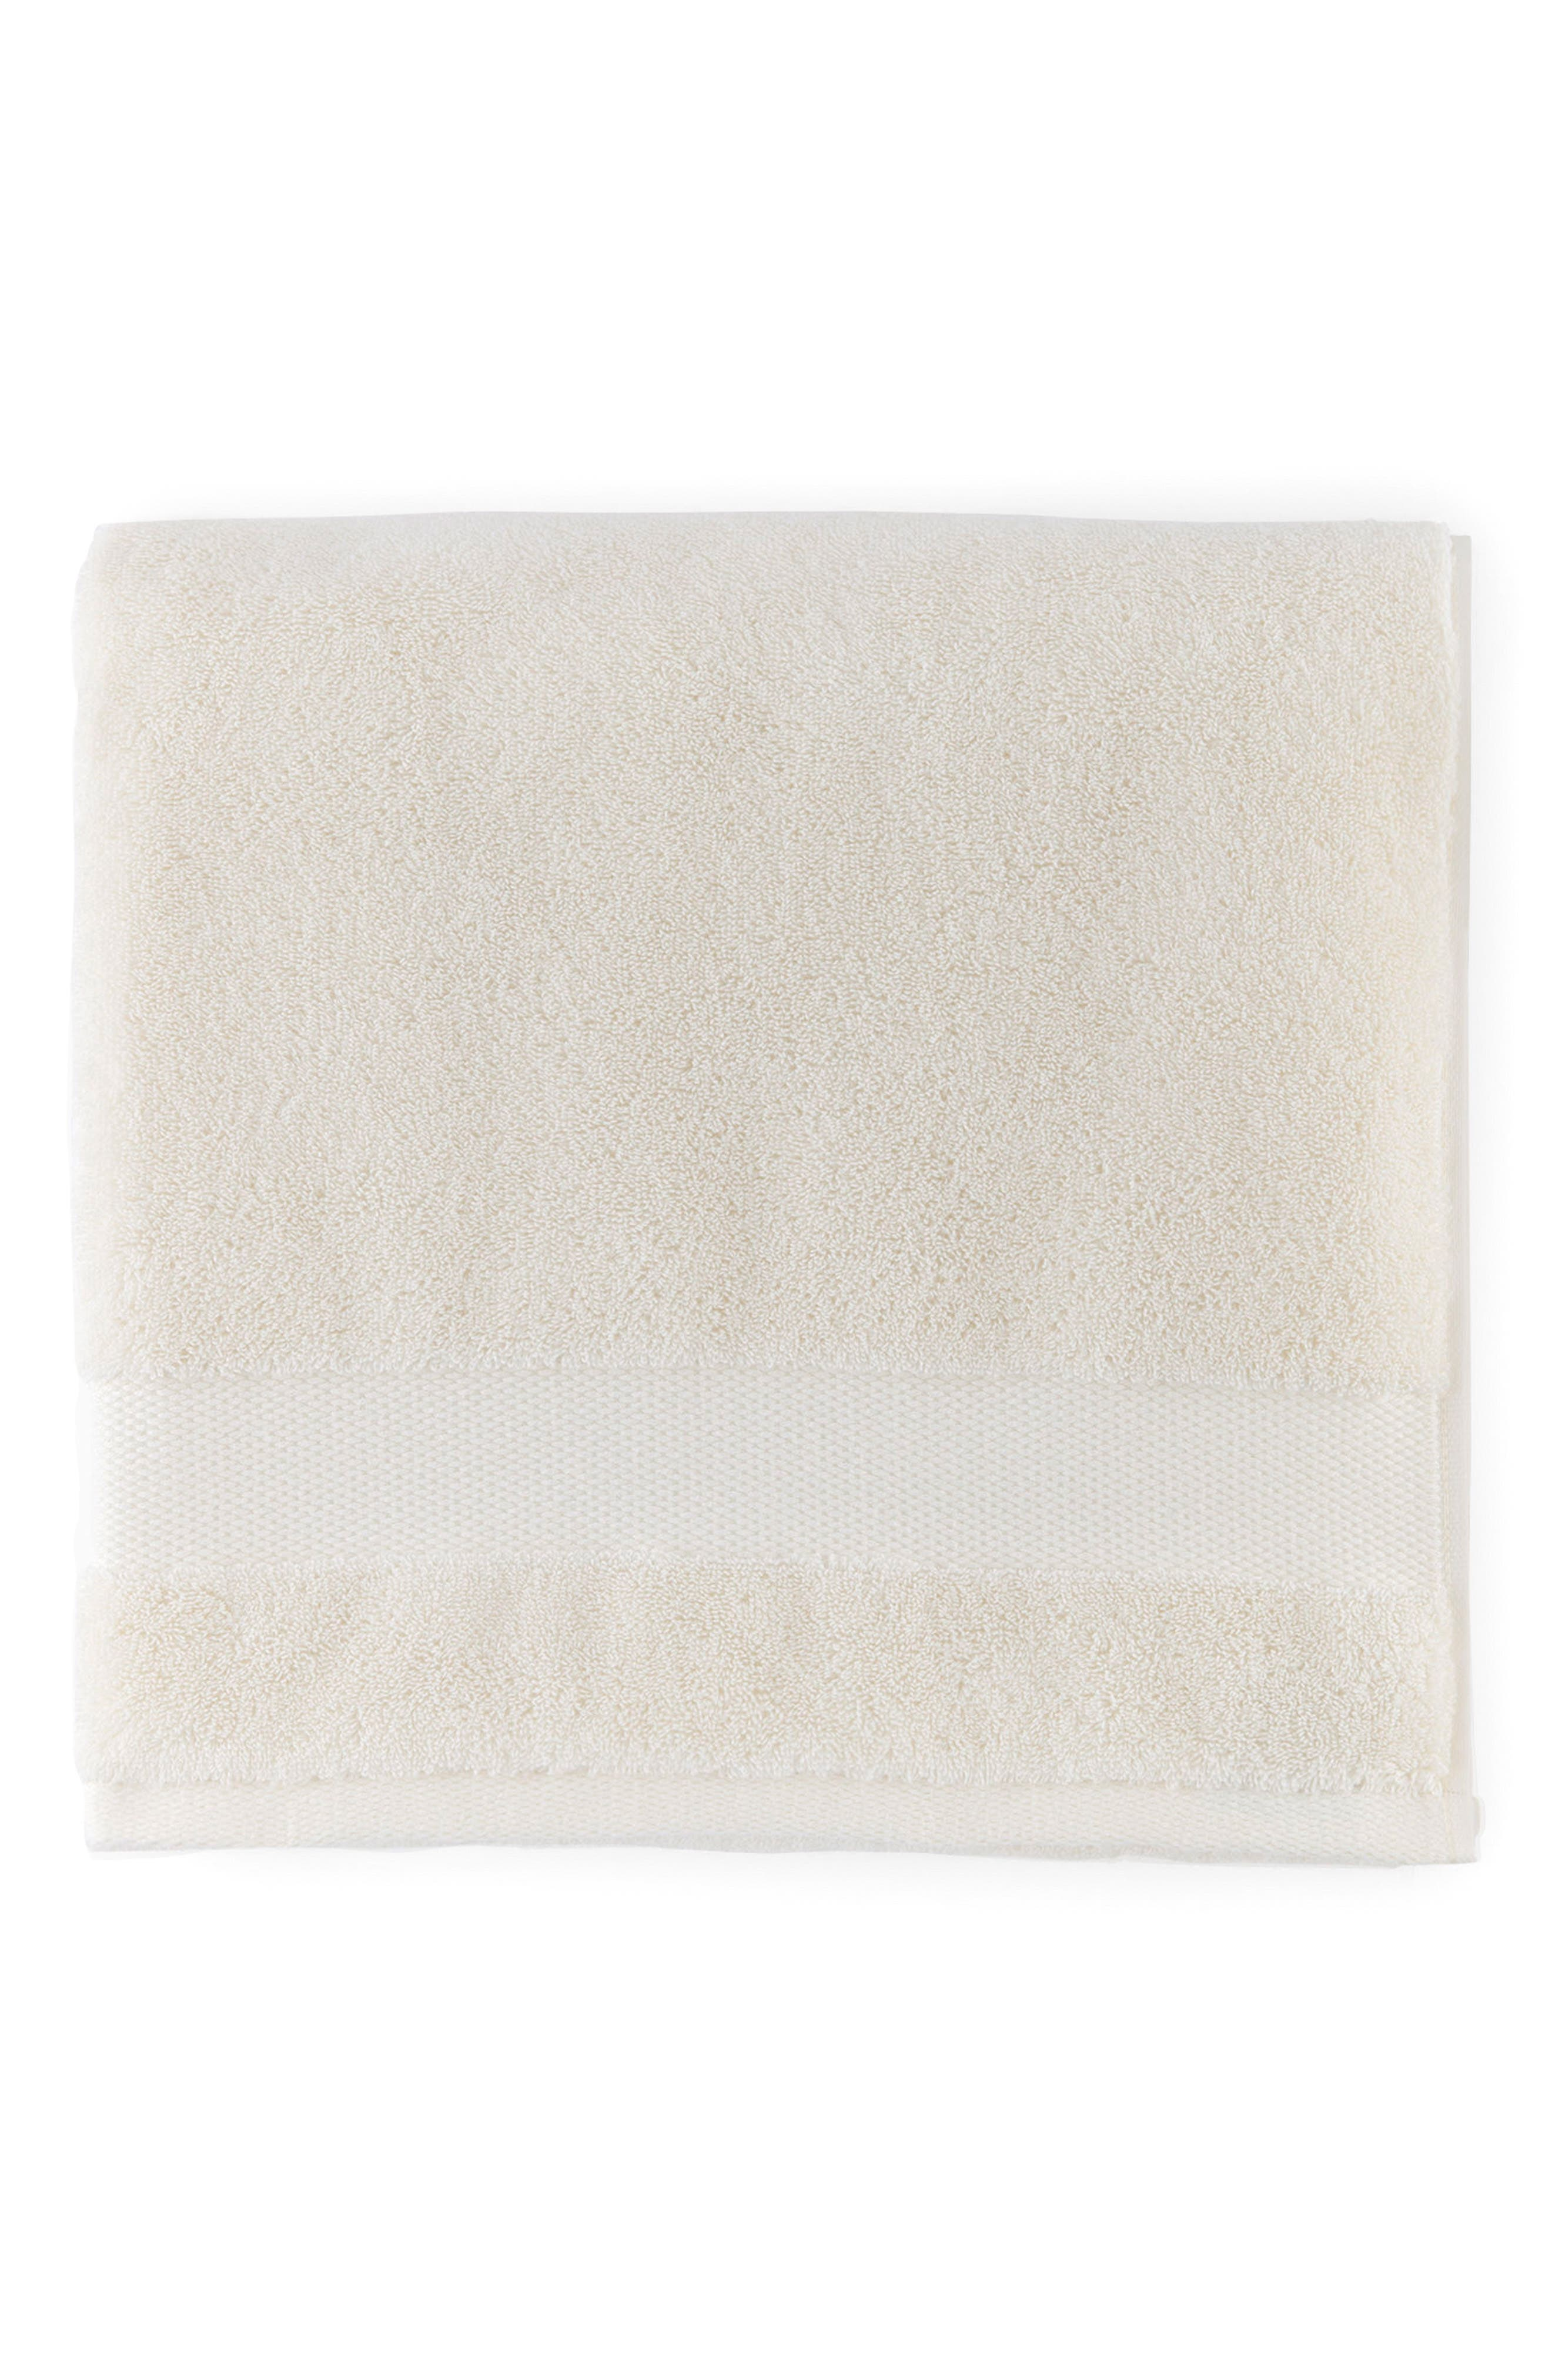 Main Image - SFERRA Bello Bath Towel